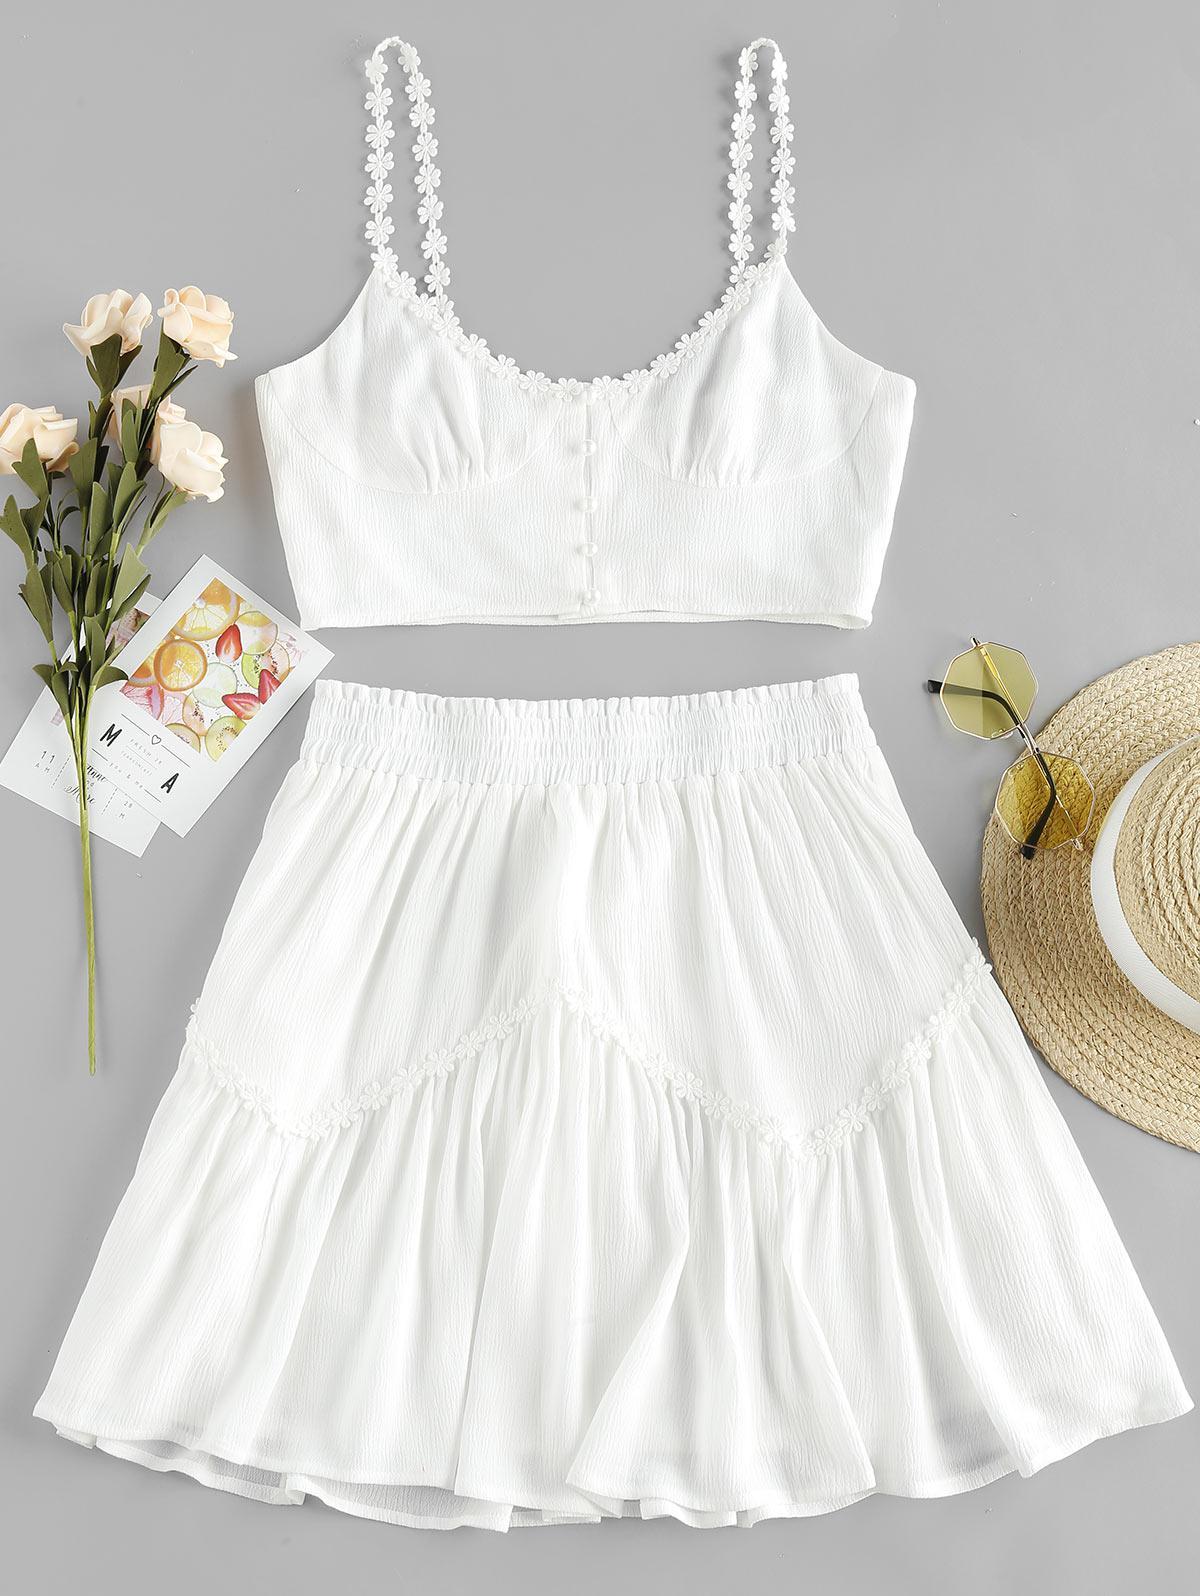 ZAFUL Flower Applique Button Up Mini Skirt Set thumbnail